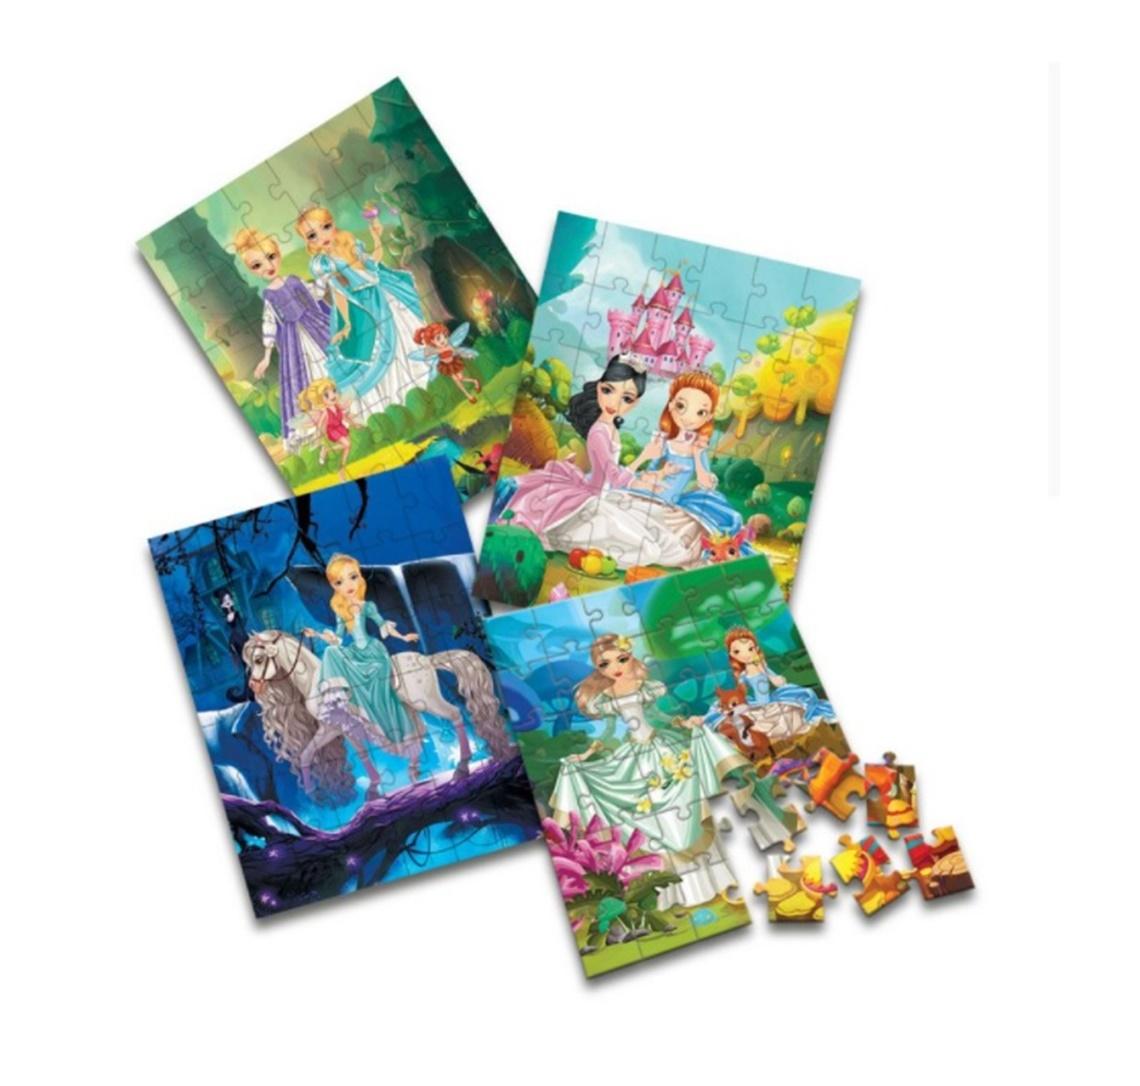 Quebra-cabeça Puzzle Princesas - Toia Brinquedos